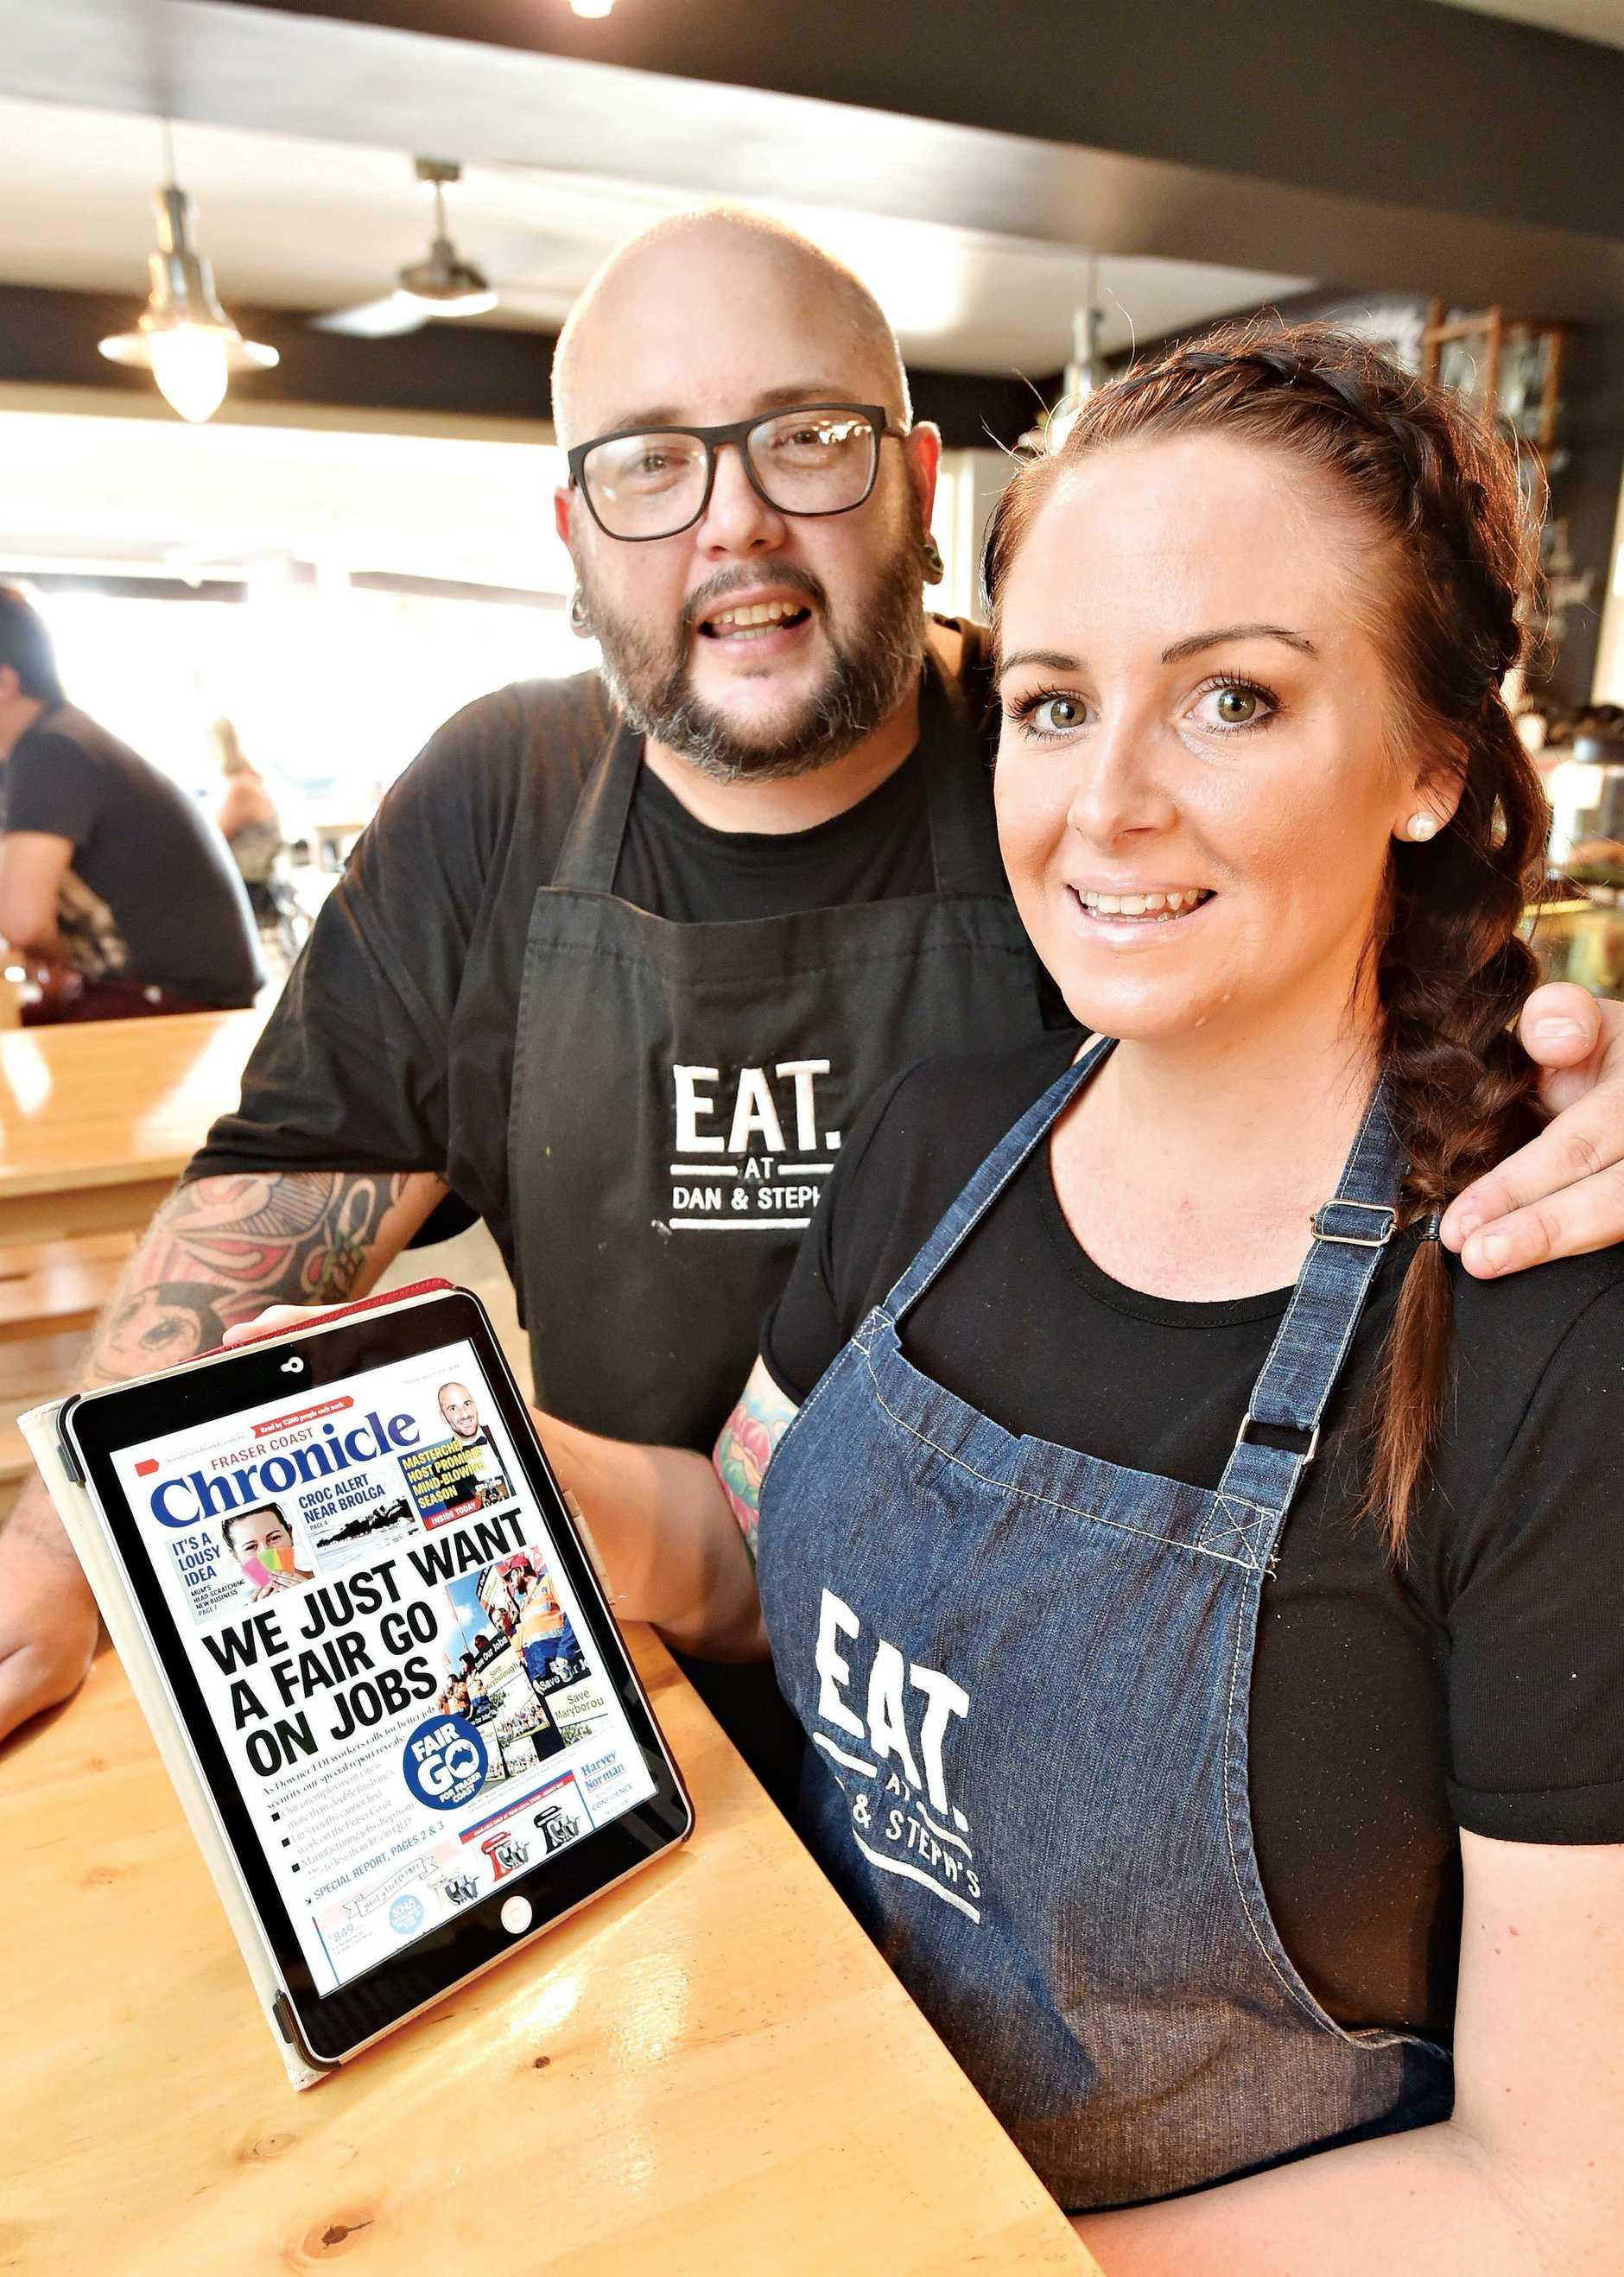 Fraser Coast Chronicle digital subscription - Dan and Steph Mulheron from Eat at Dan & Steph's. Photo: Alistair Brightman / Fraser Coast Chronicle